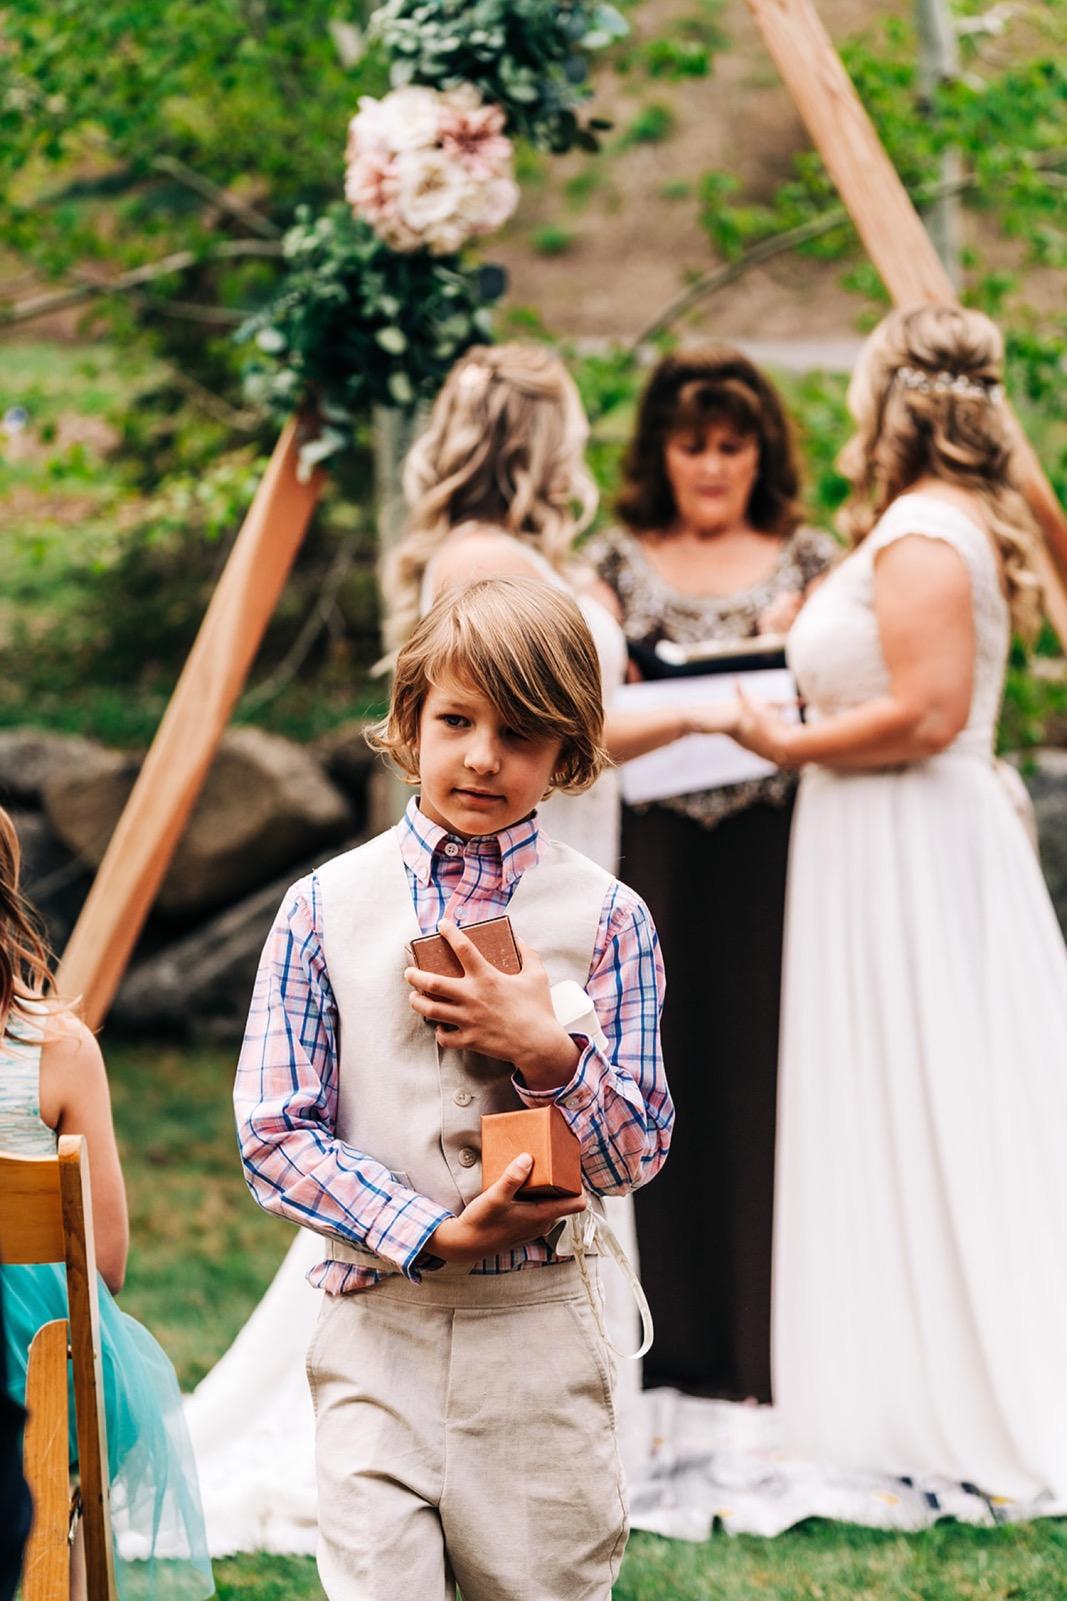 085_falissa_heather_wedding-216.jpg